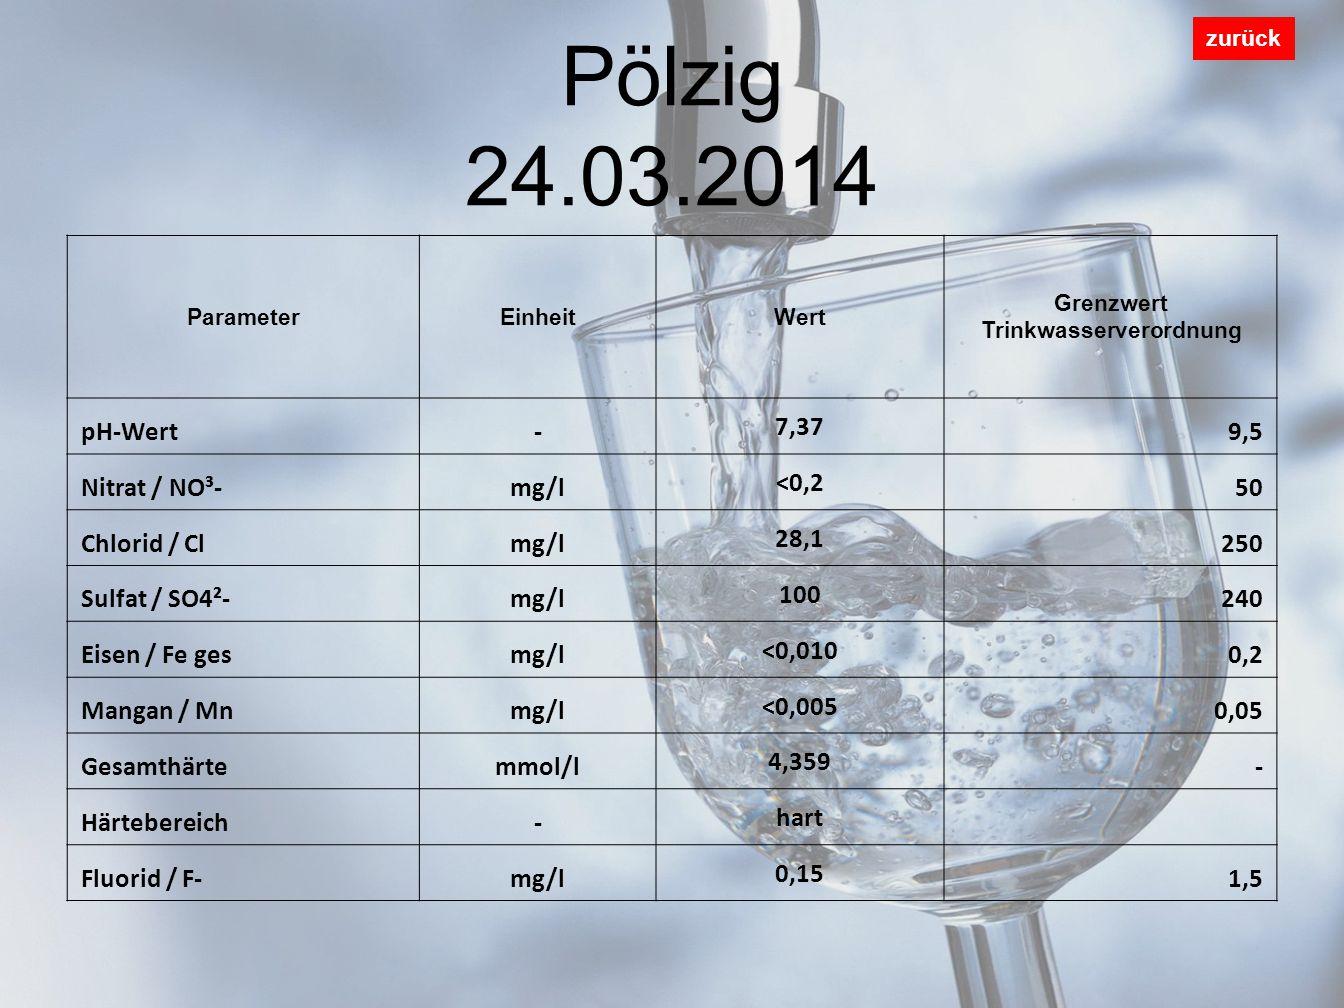 Pölzig 24.03.2014 zurück ParameterEinheitWert Grenzwert Trinkwasserverordnung pH-Wert- 7,37 9,5 Nitrat / NO³-mg/l <0,2 50 Chlorid / Clmg/l 28,1 250 Sulfat / SO4²-mg/l 100 240 Eisen / Fe gesmg/l <0,010 0,2 Mangan / Mnmg/l <0,005 0,05 Gesamthärtemmol/l 4,359 - Härtebereich- hart Fluorid / F-mg/l 0,15 1,5